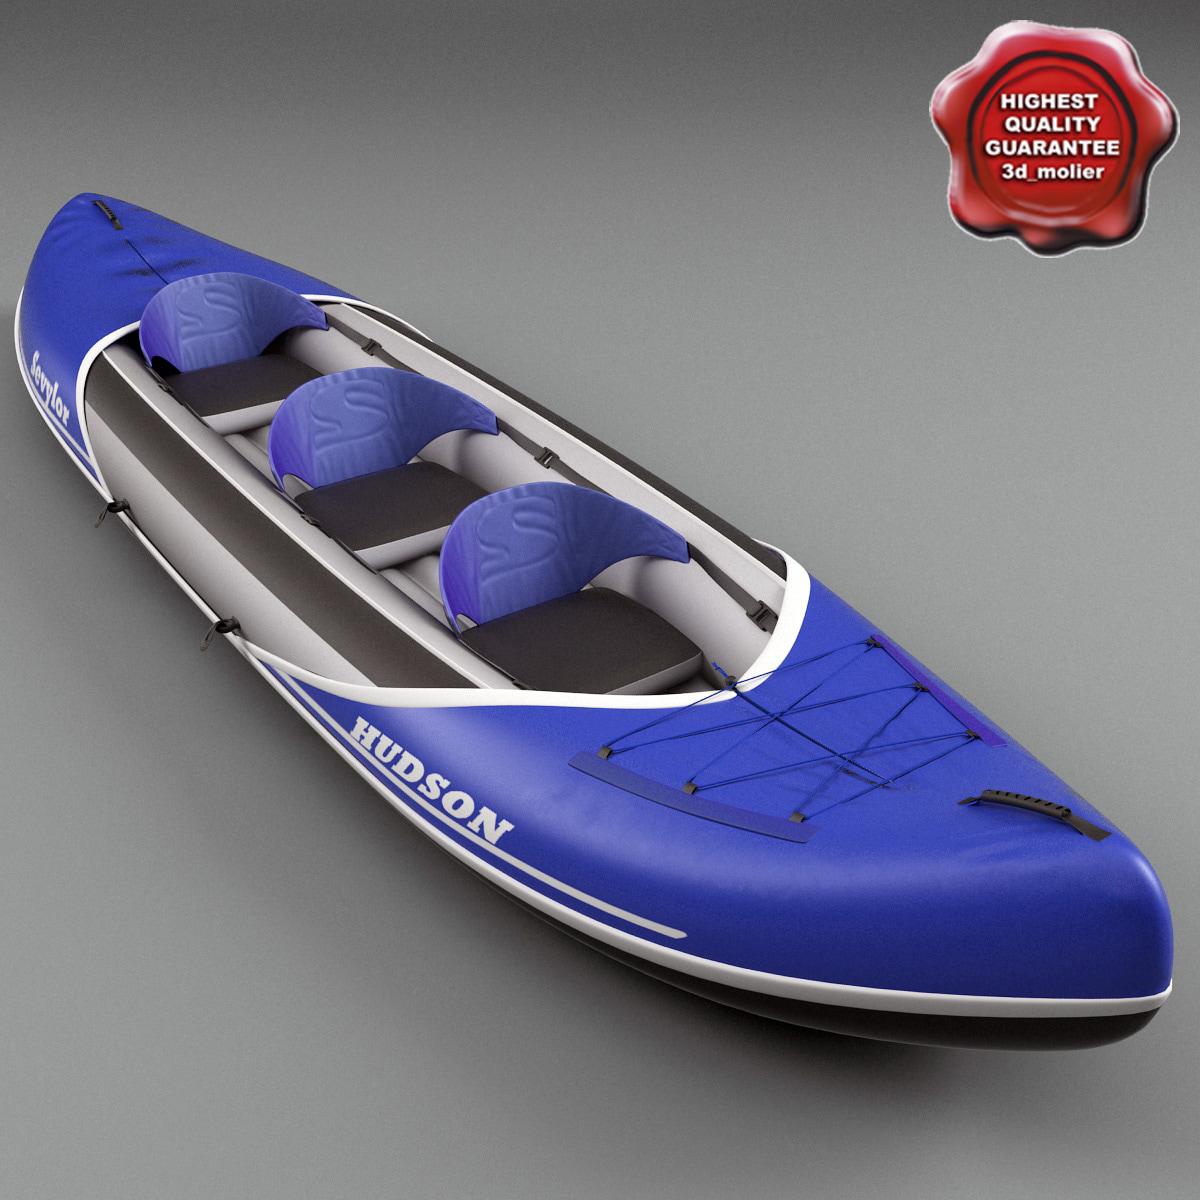 kayak sevylor hudson 3ds